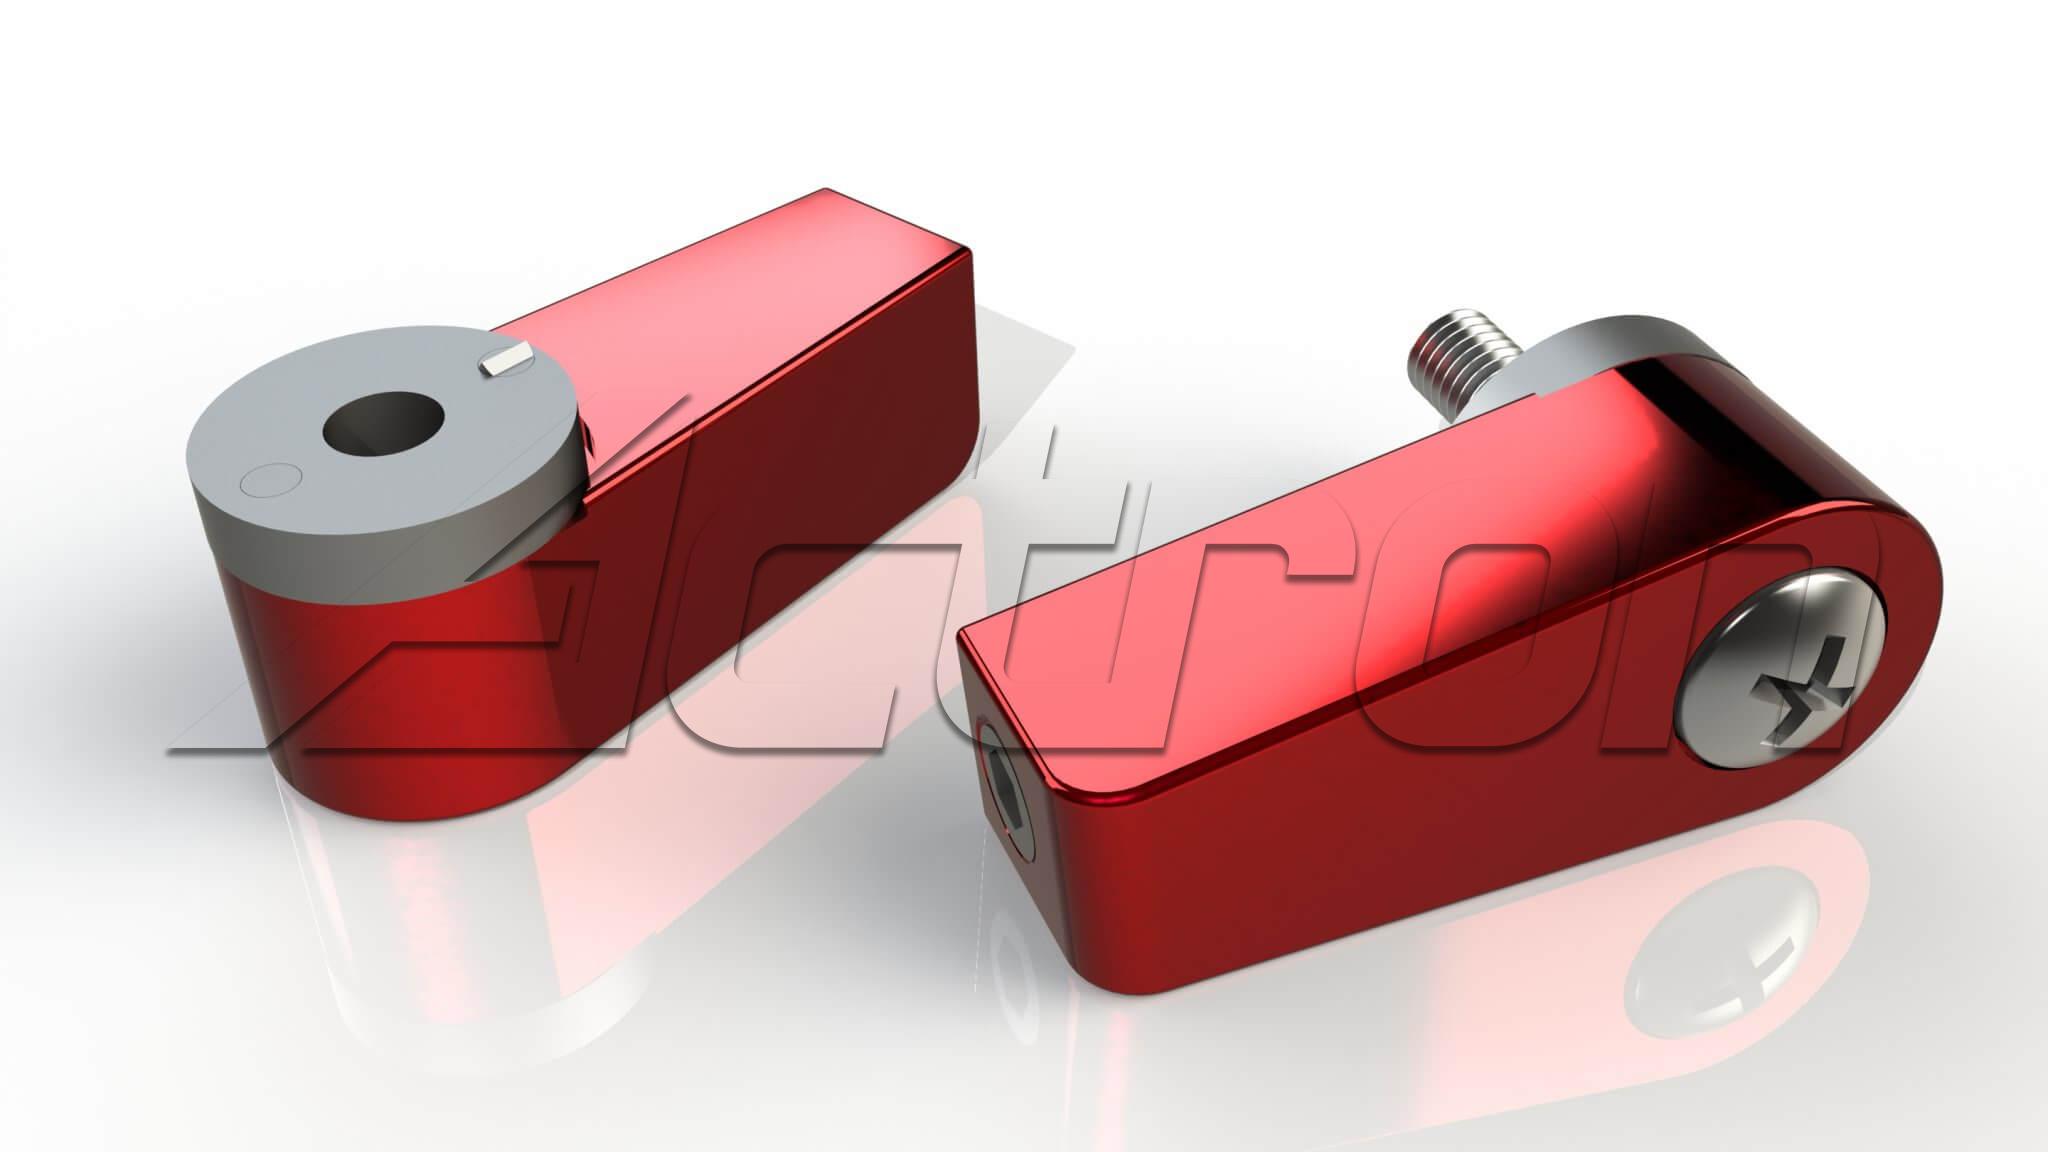 1-4-turn-retainer-4847-a35623.jpg